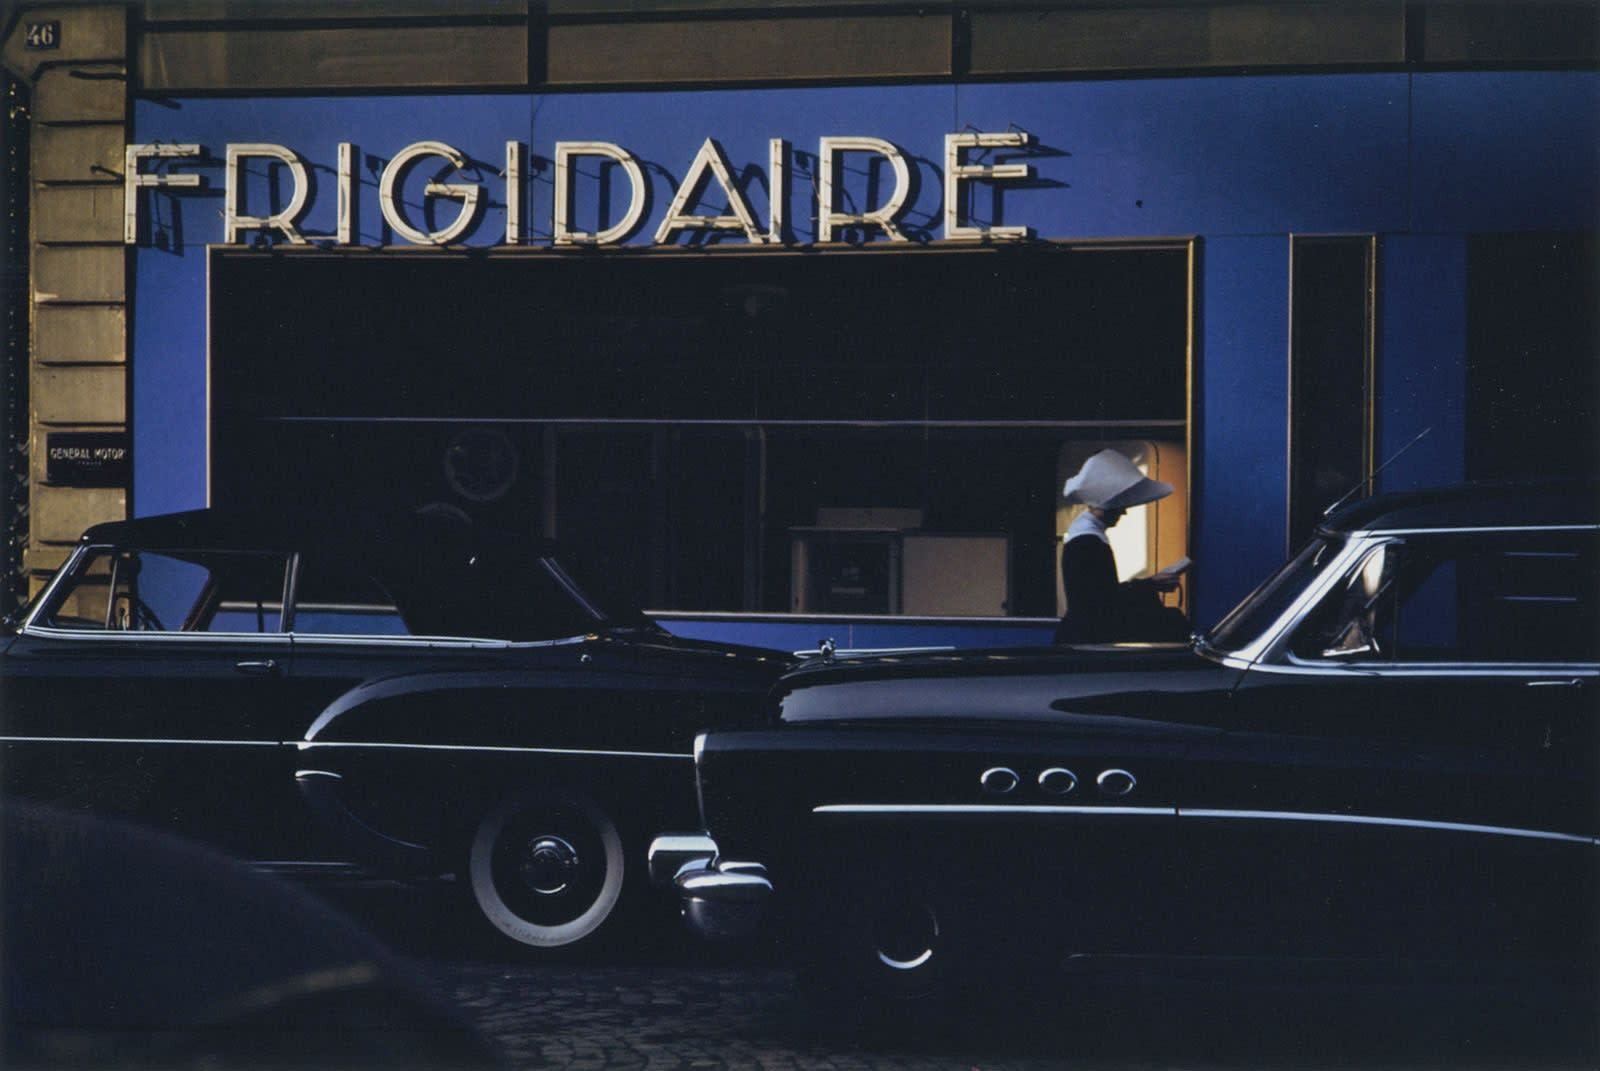 Ernst Haas, Frigidaire, Paris, 1954